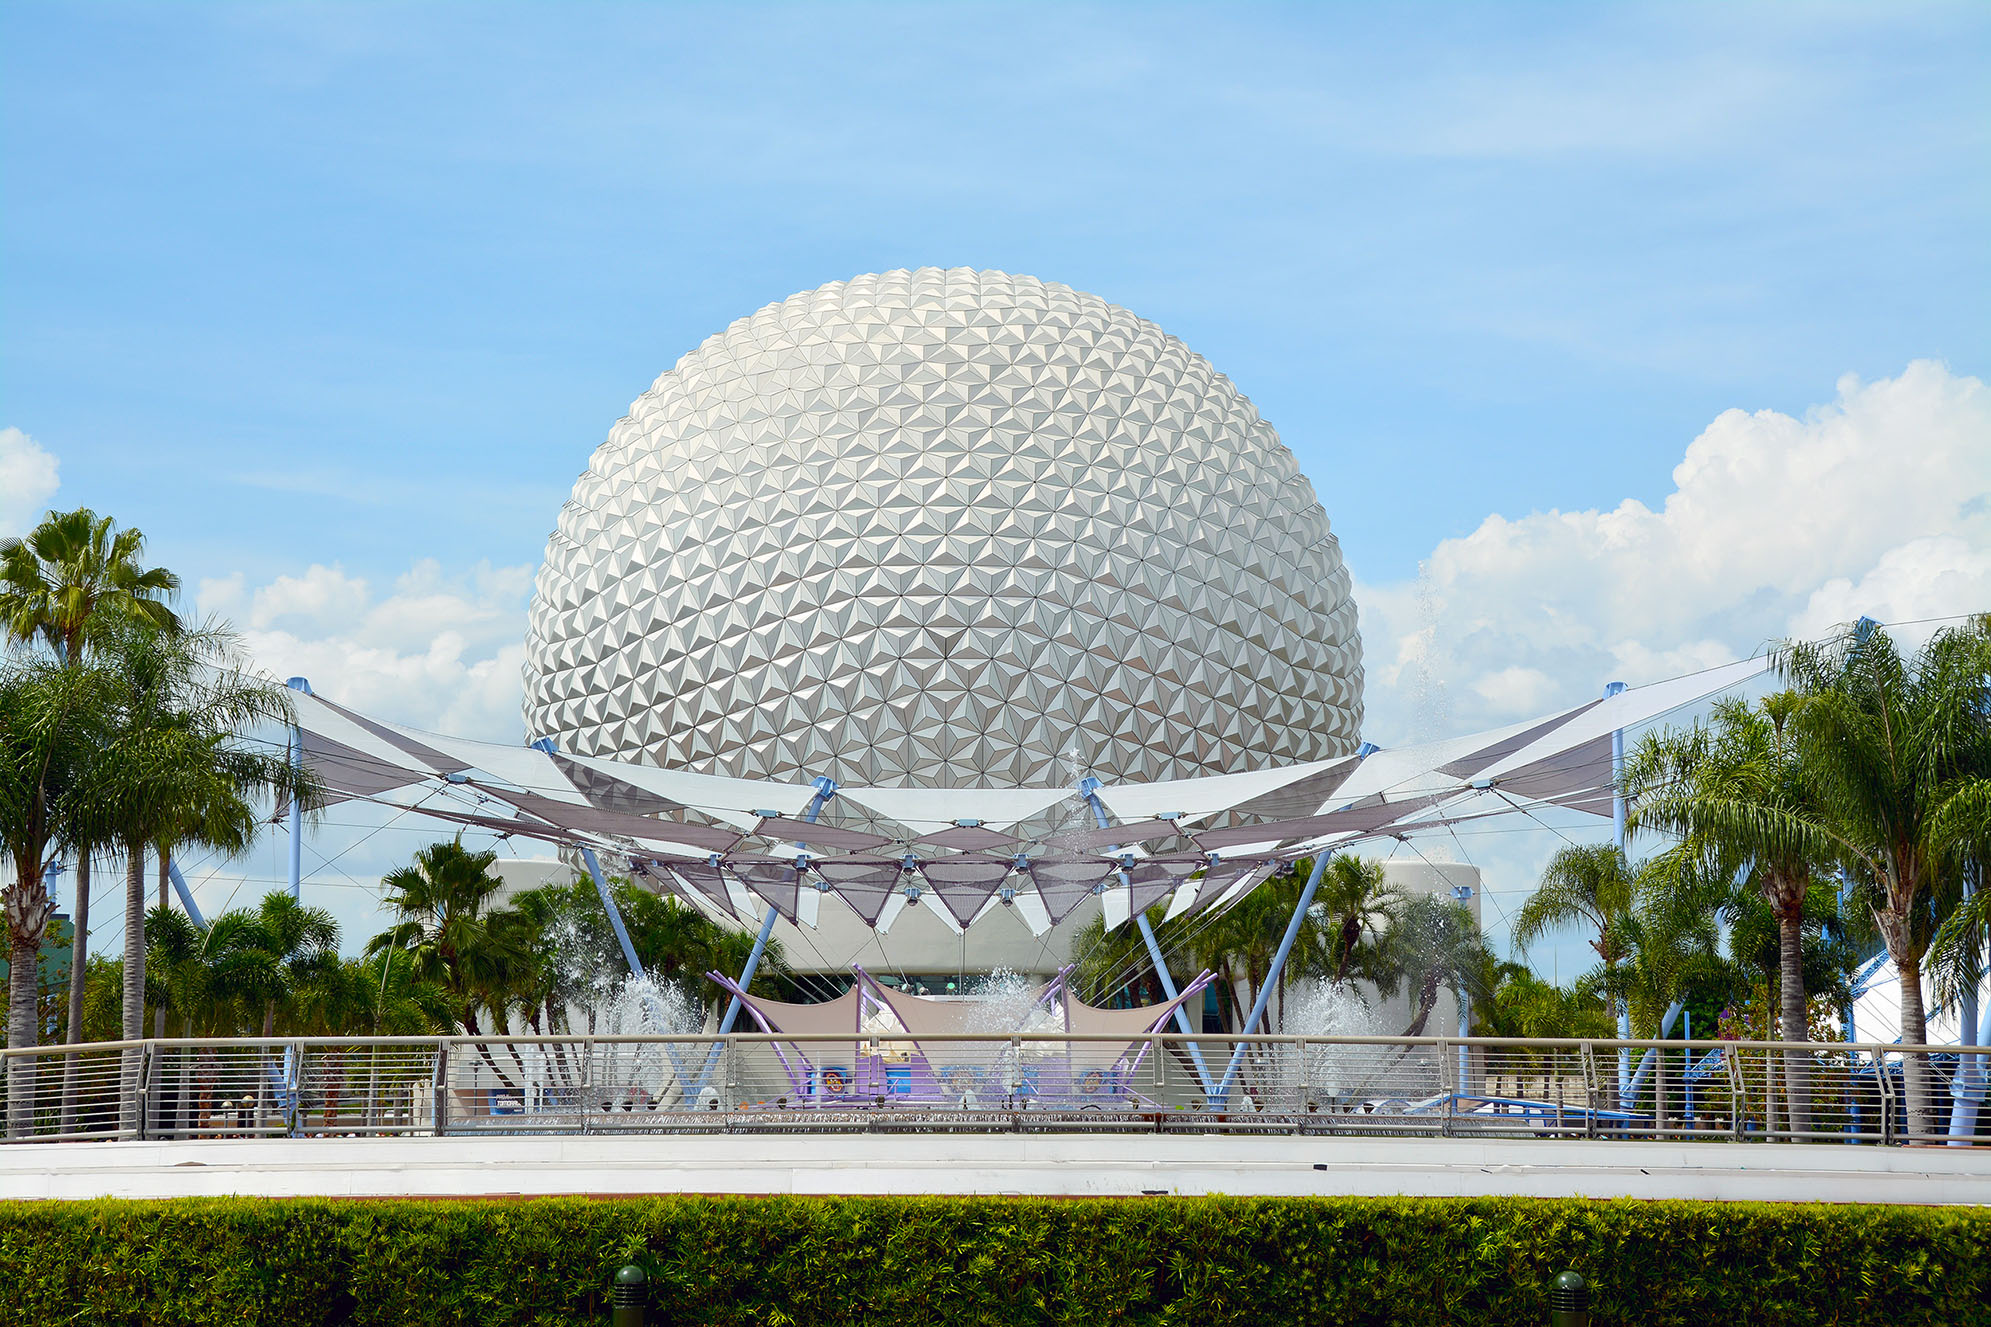 Spaceship Earth Epcot Walt Disney World i Orlando